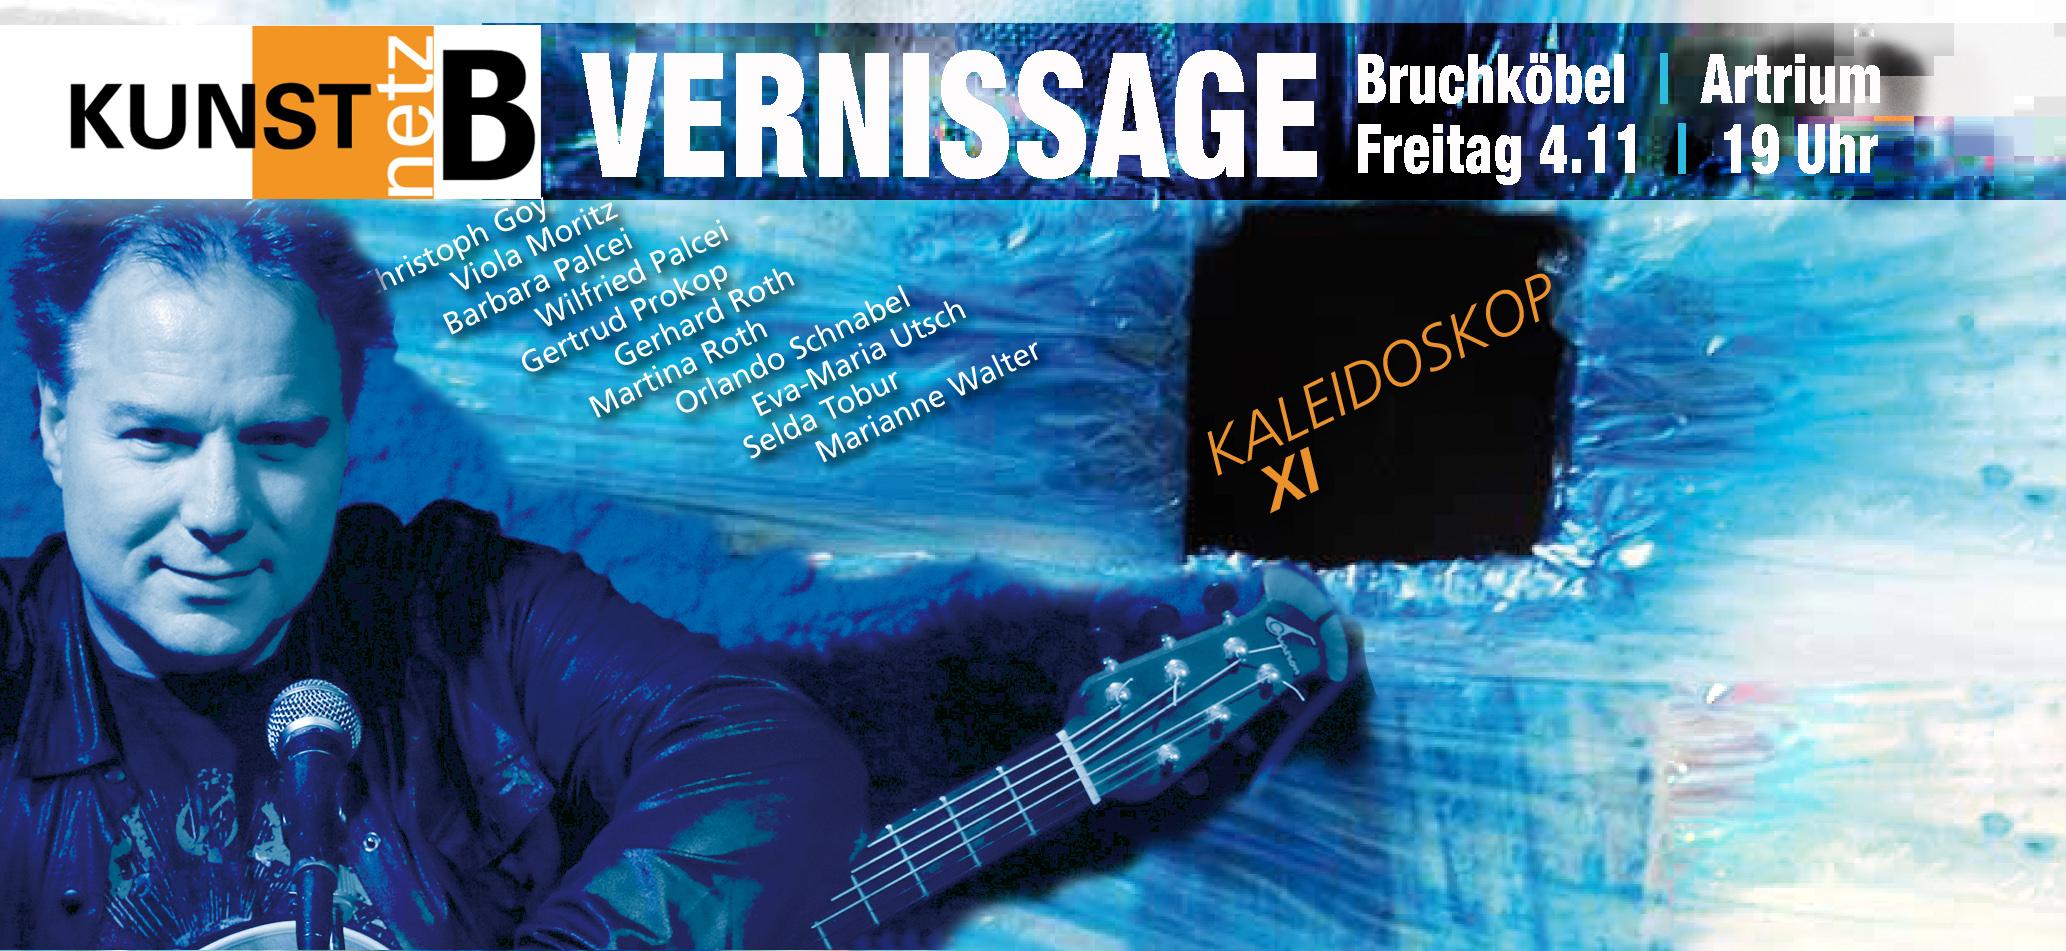 Kaleidoskop Kunstnetz-B  |  Vernissage @ Artrium Kunstnetz-B | Bruchköbel | Hessen | Deutschland